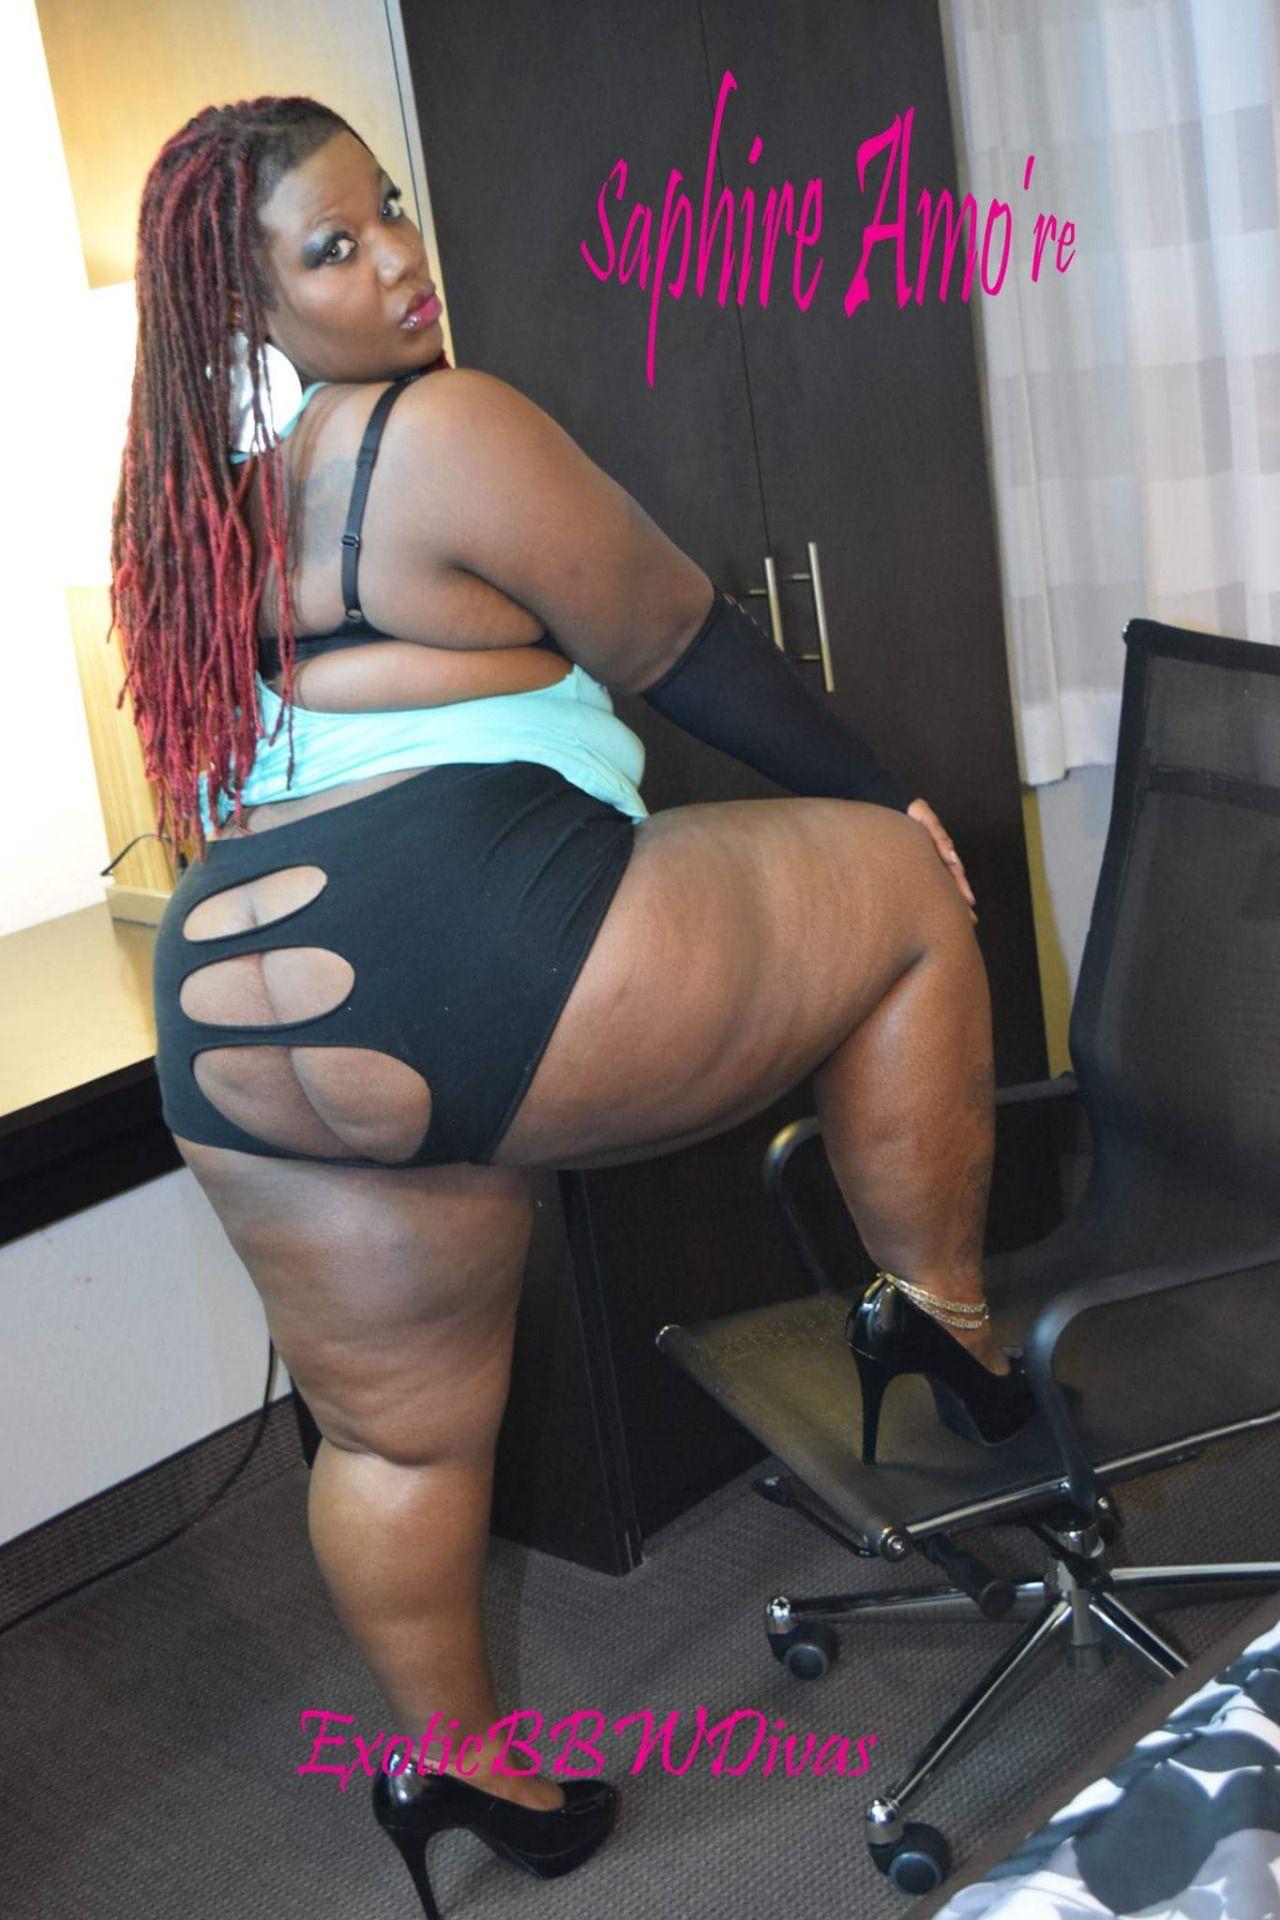 Pluscious Saphire Amore Black Chicks Photo Viewer Full Figured